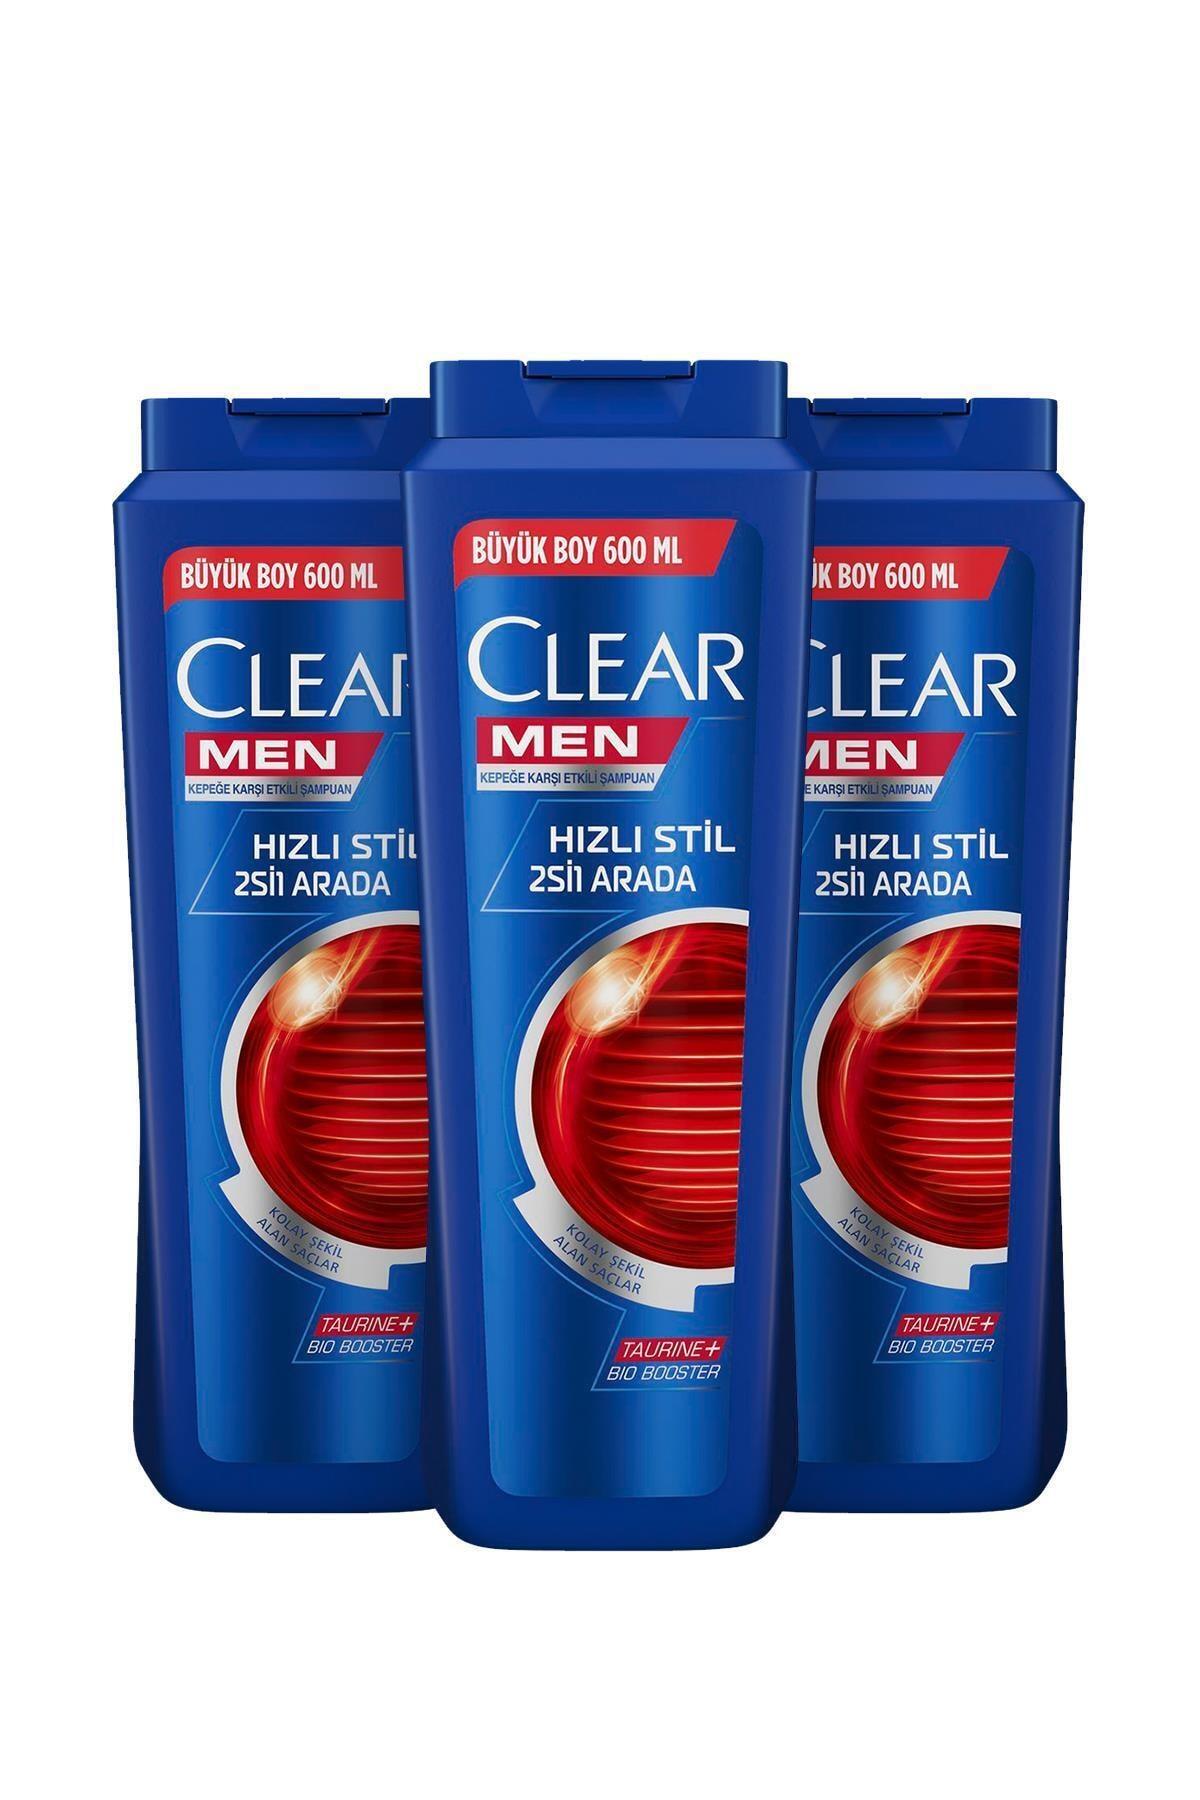 Clear Men Hızlı Stil 2si1 Arada Şampuan 600ml X3 2